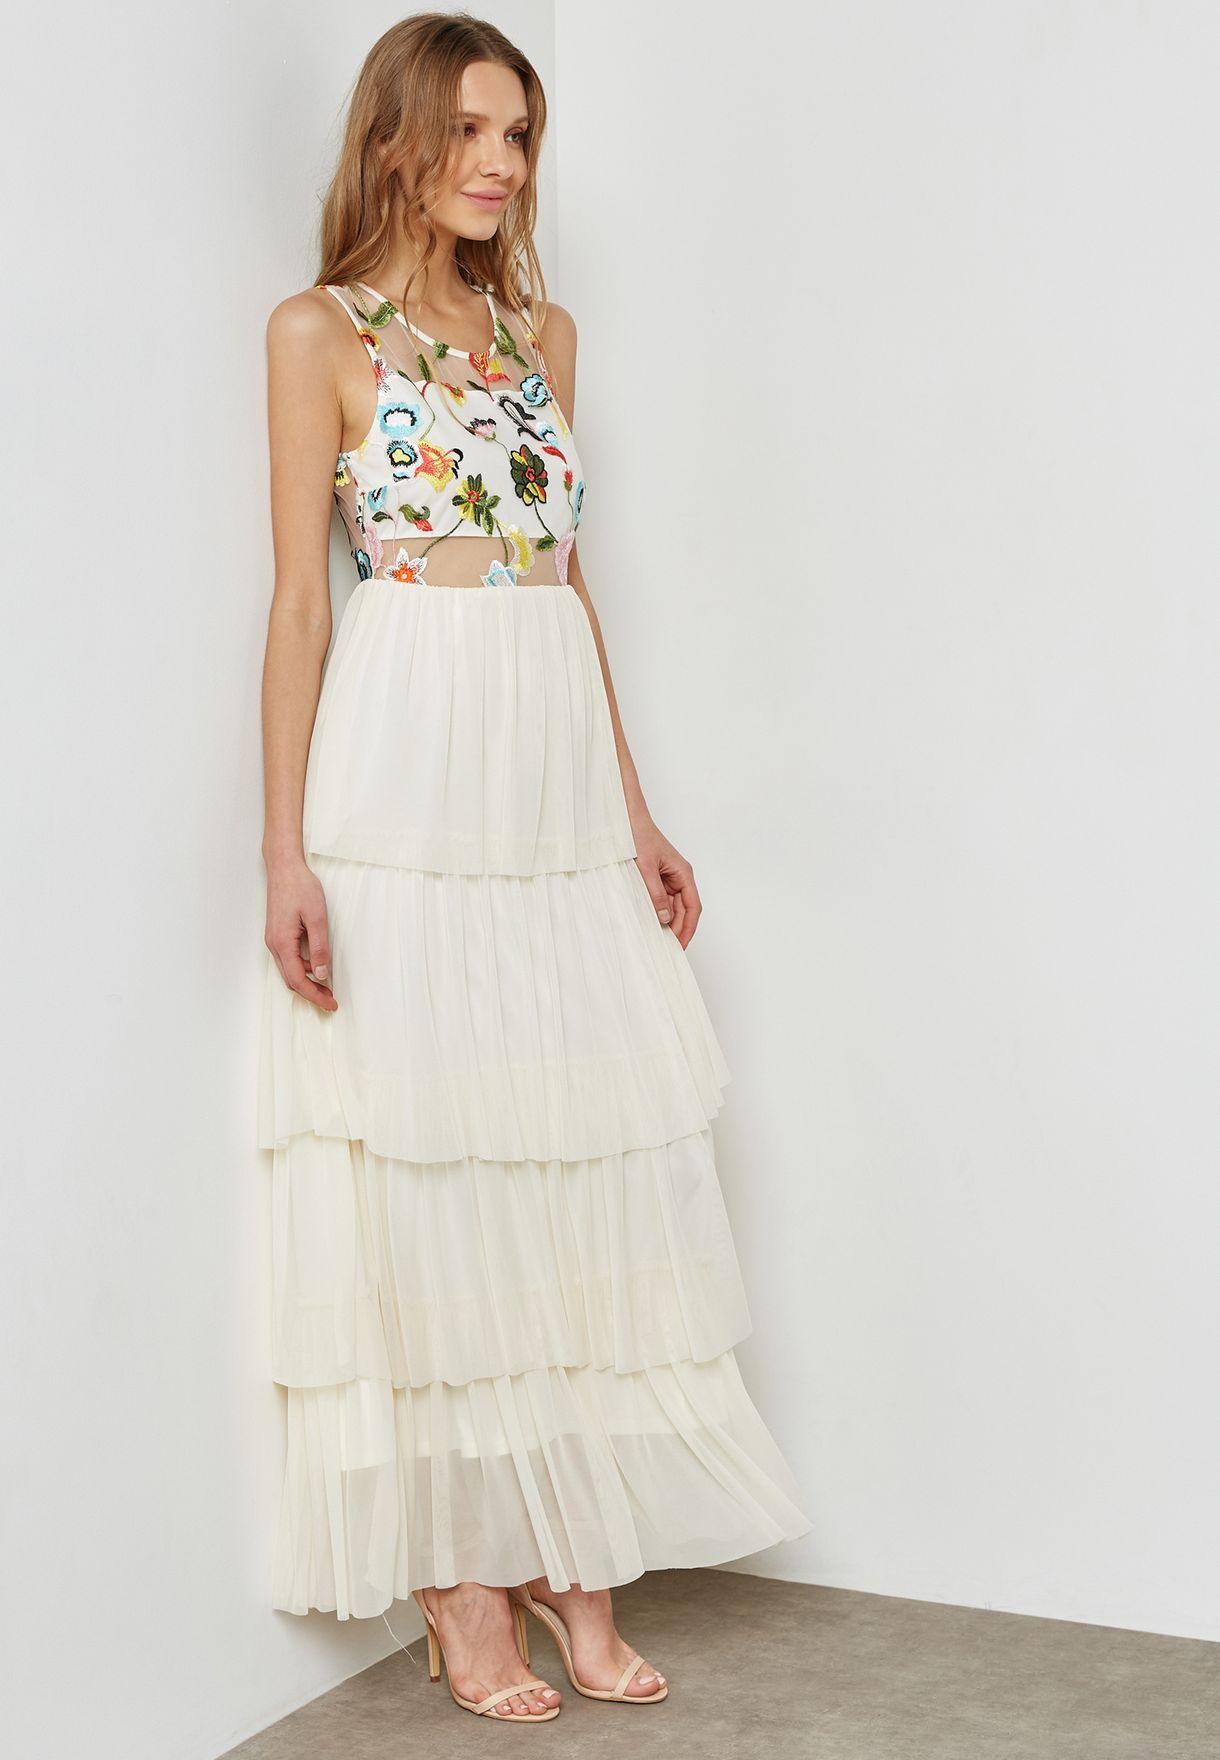 37c27a64a249 Shop Vero Moda white Embroidered Pleated Maxi Dress 10197127 for ...